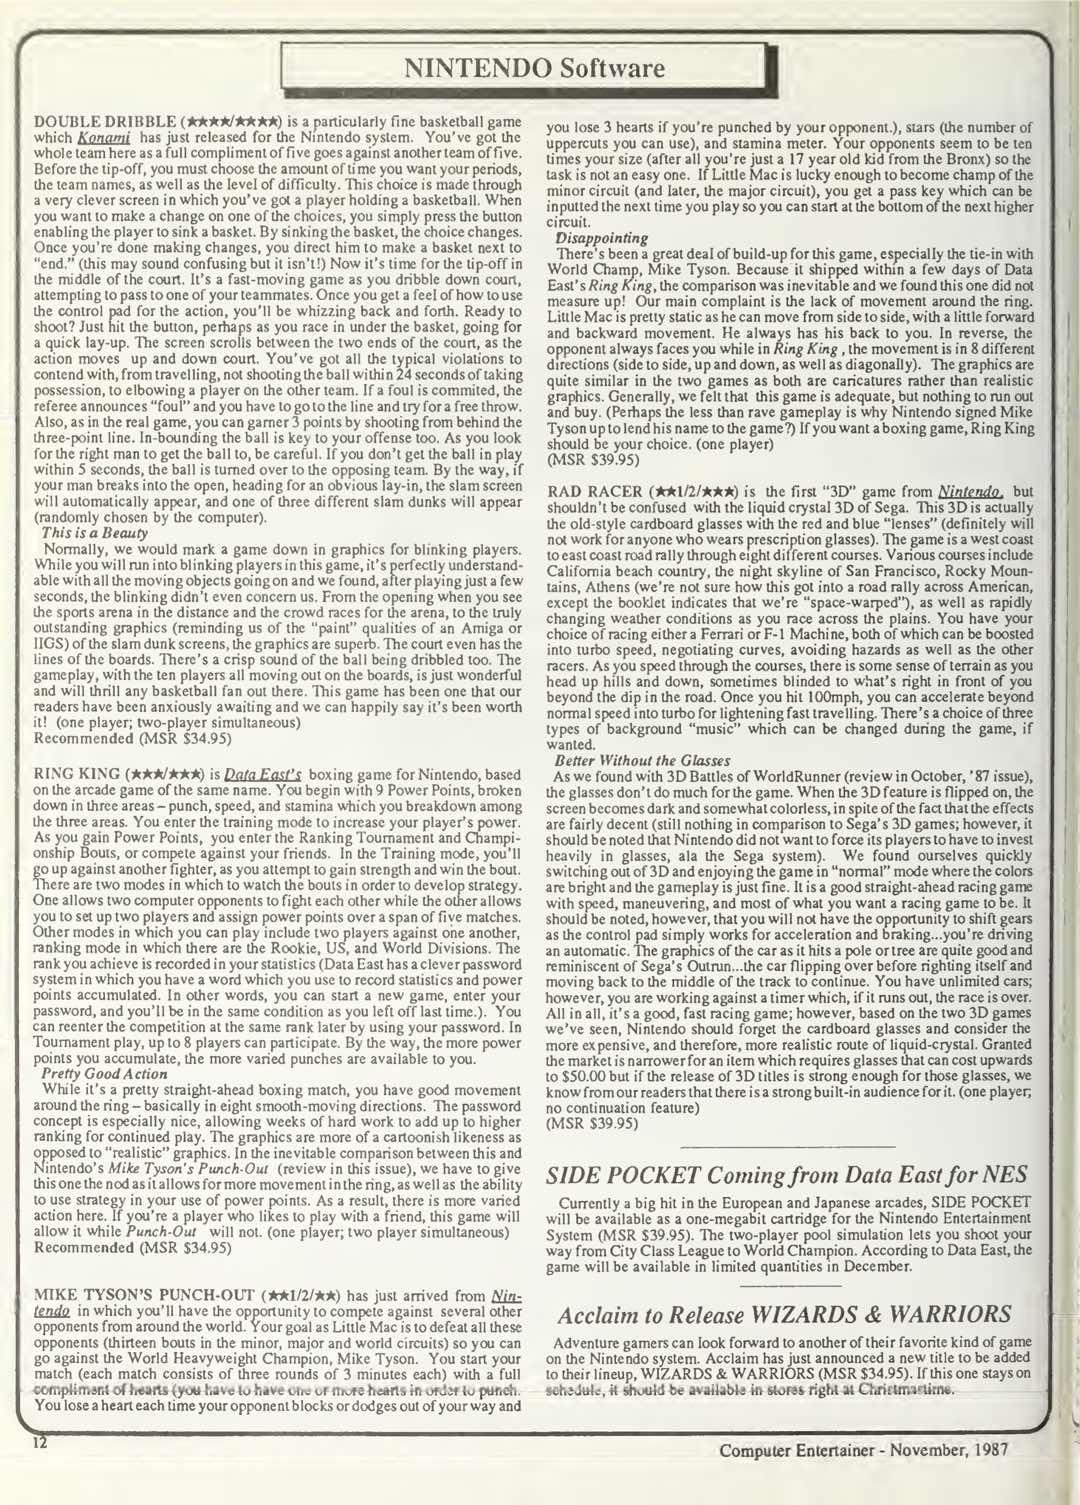 Computer Entertainer - November 1987 - Pg12